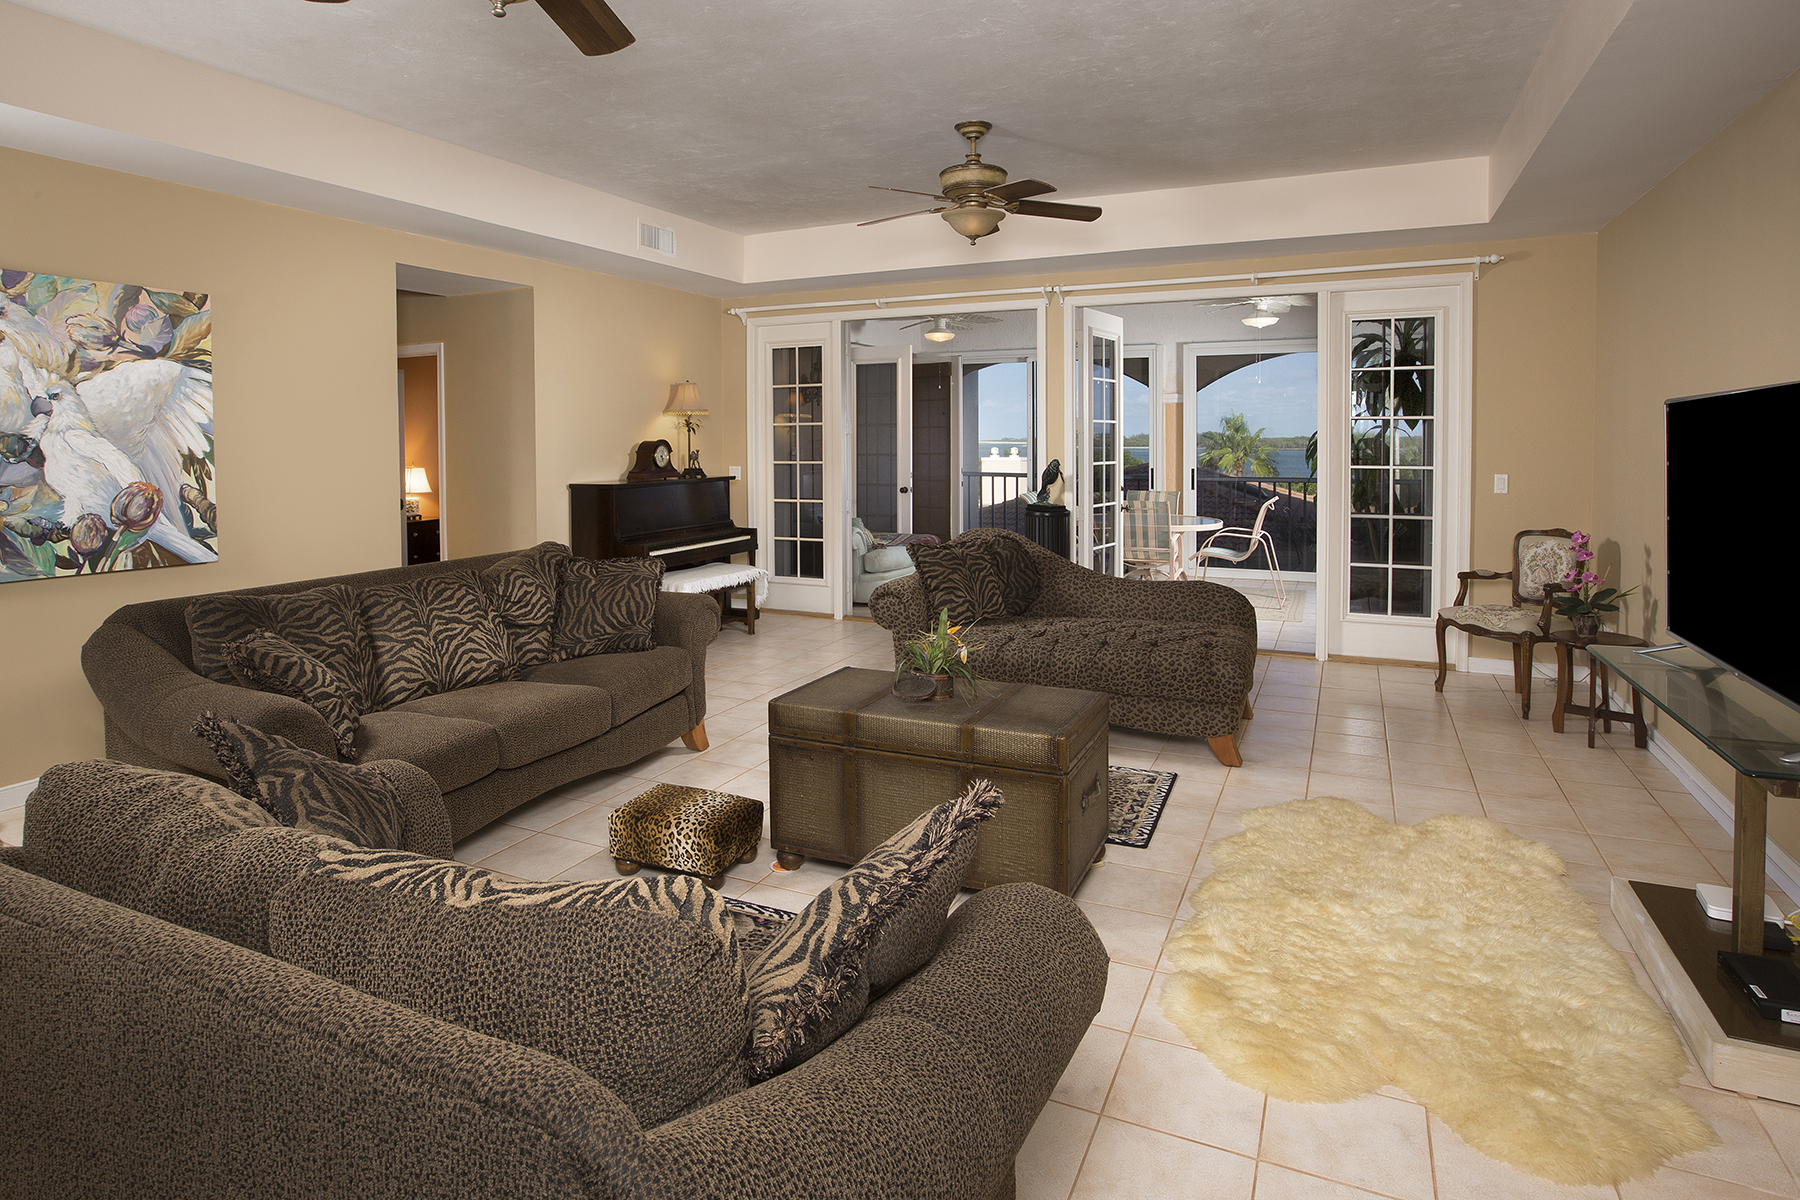 Condomínio para Venda às MARCO ISLAND 2000 Royal Marco Way 308 Marco Island, Florida, 34145 Estados Unidos